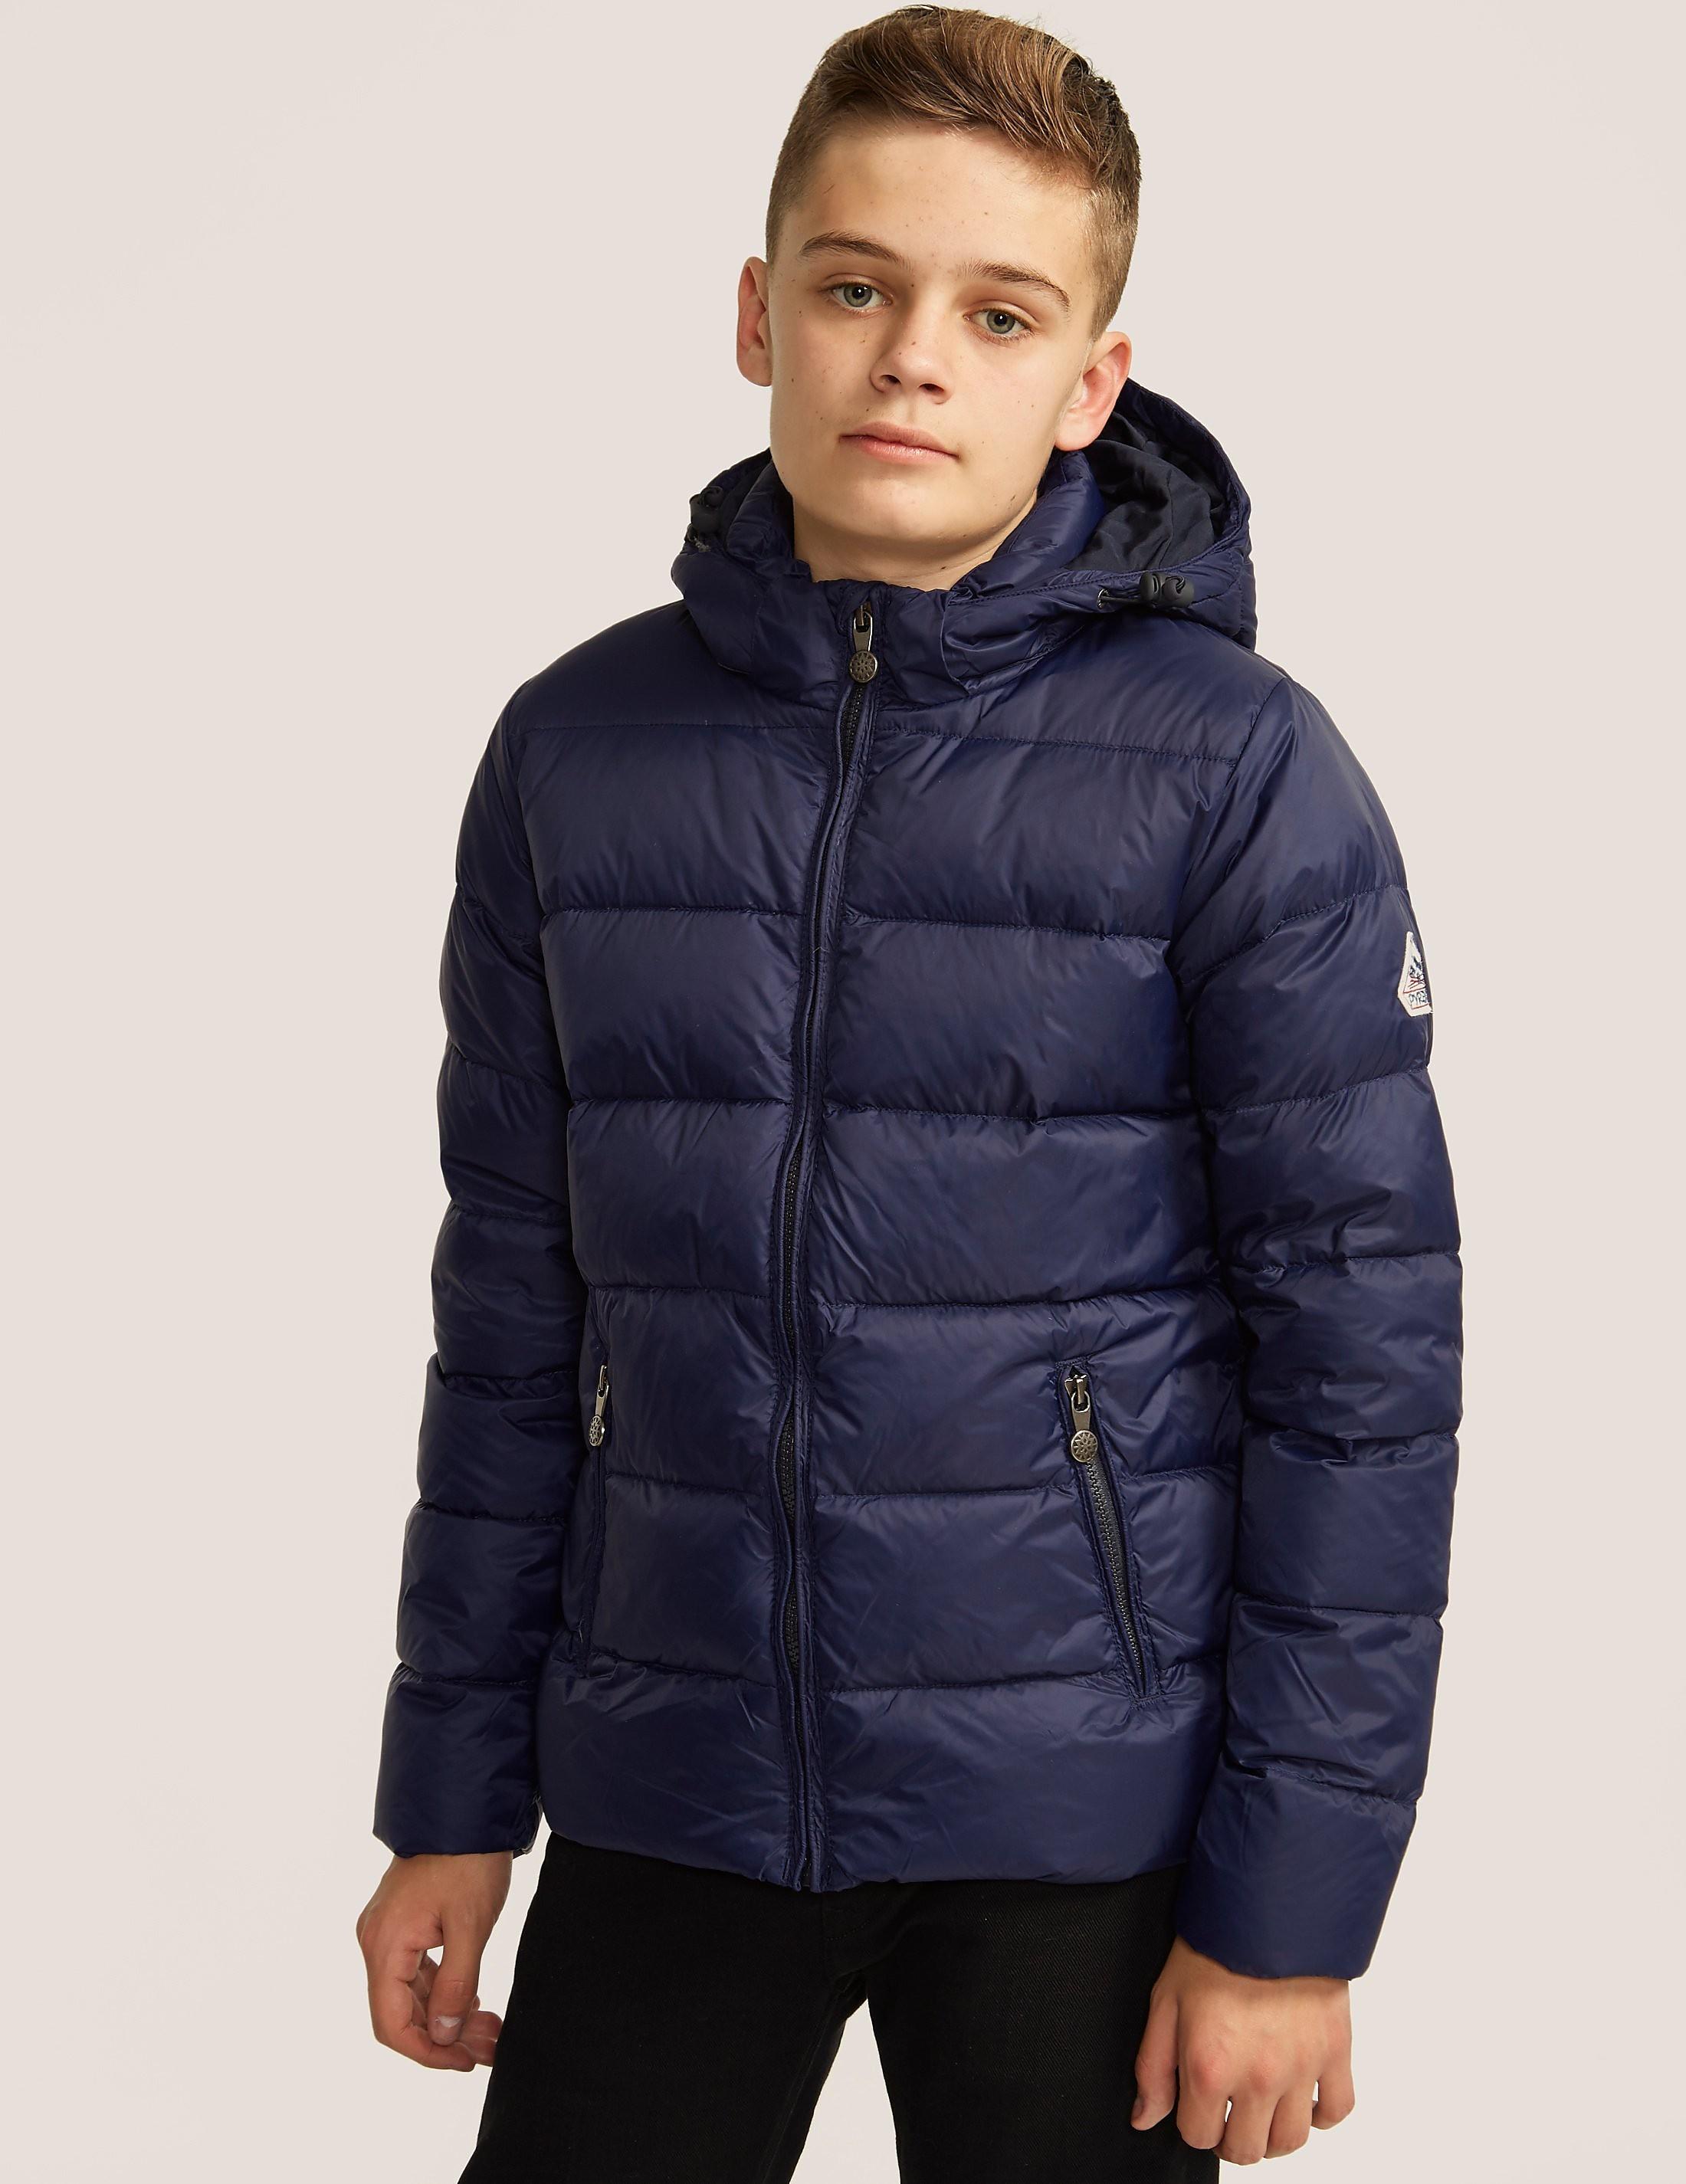 Pyrenex Spout Jacket